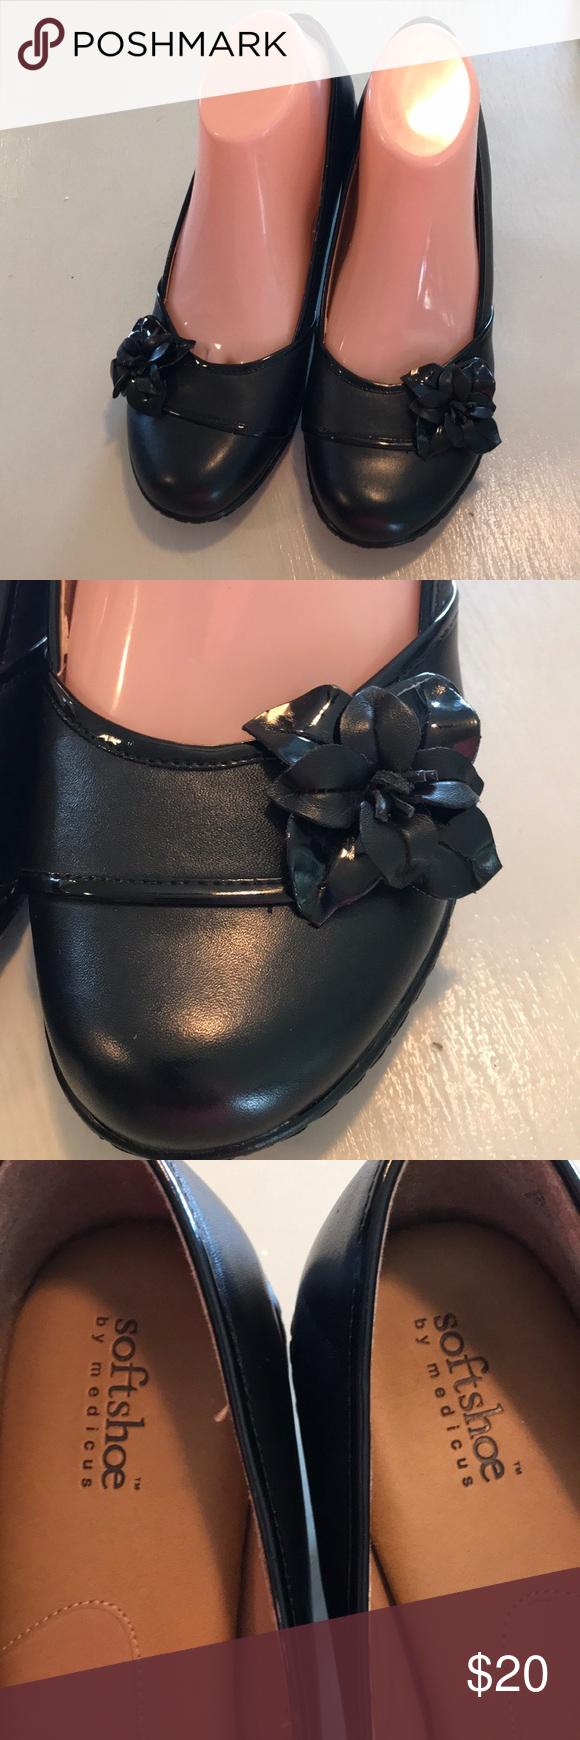 Size 9 black Softshoe leather heeled pumps Excellent